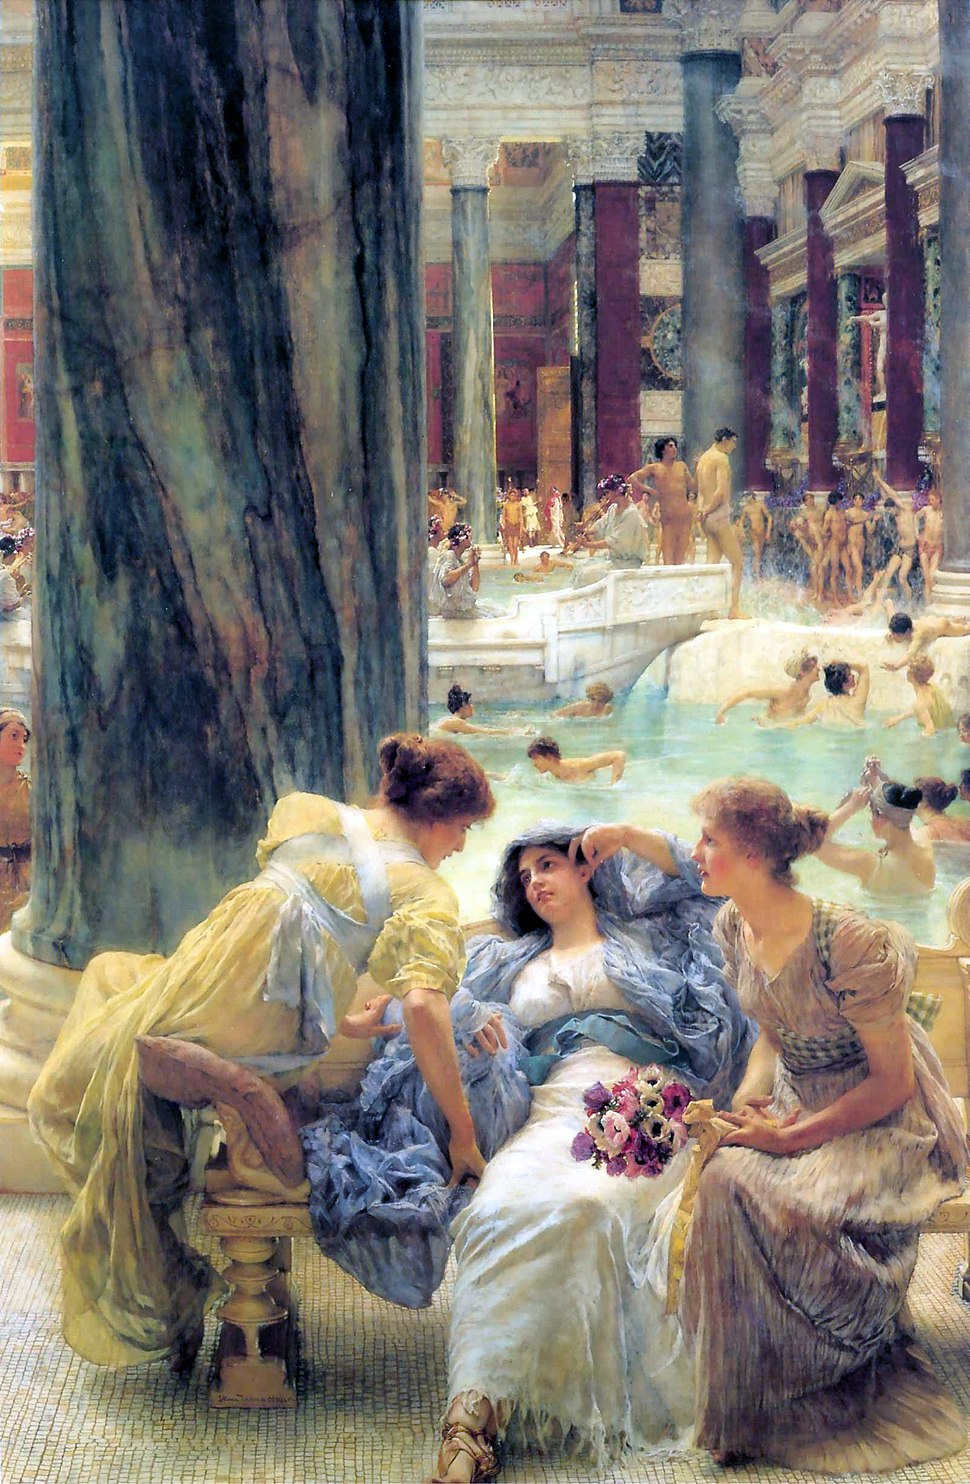 The Baths at Caracalla